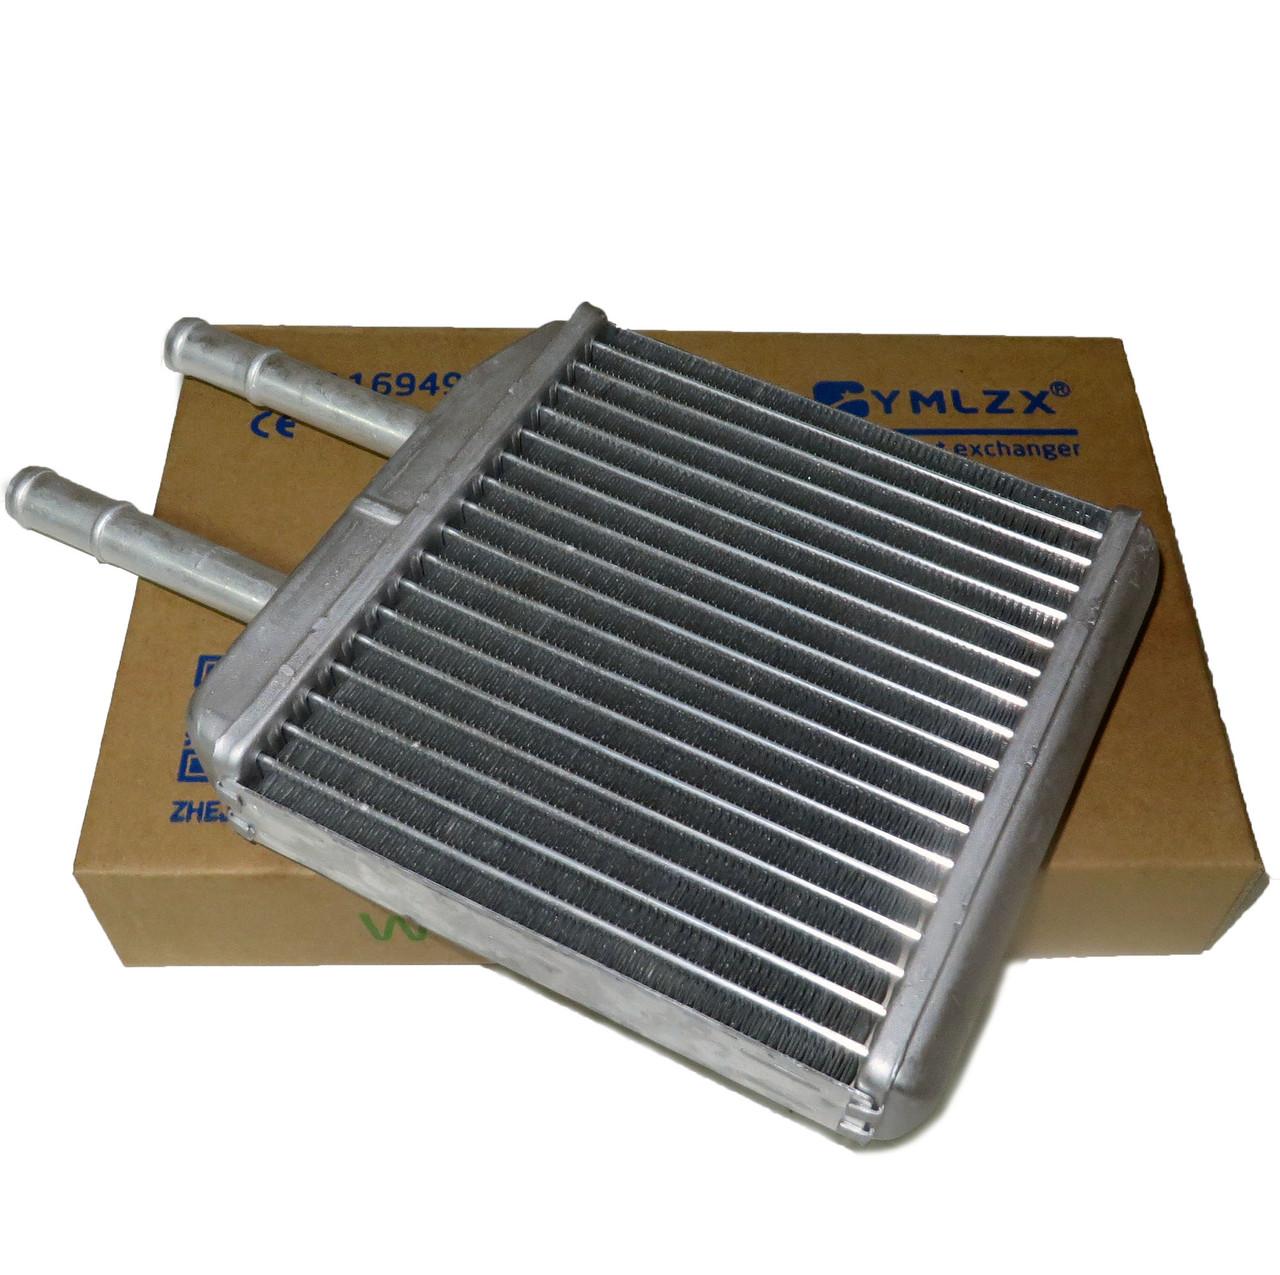 Радіатор пічки Матіз, YMLZX, YML-BH-140, 96314858-